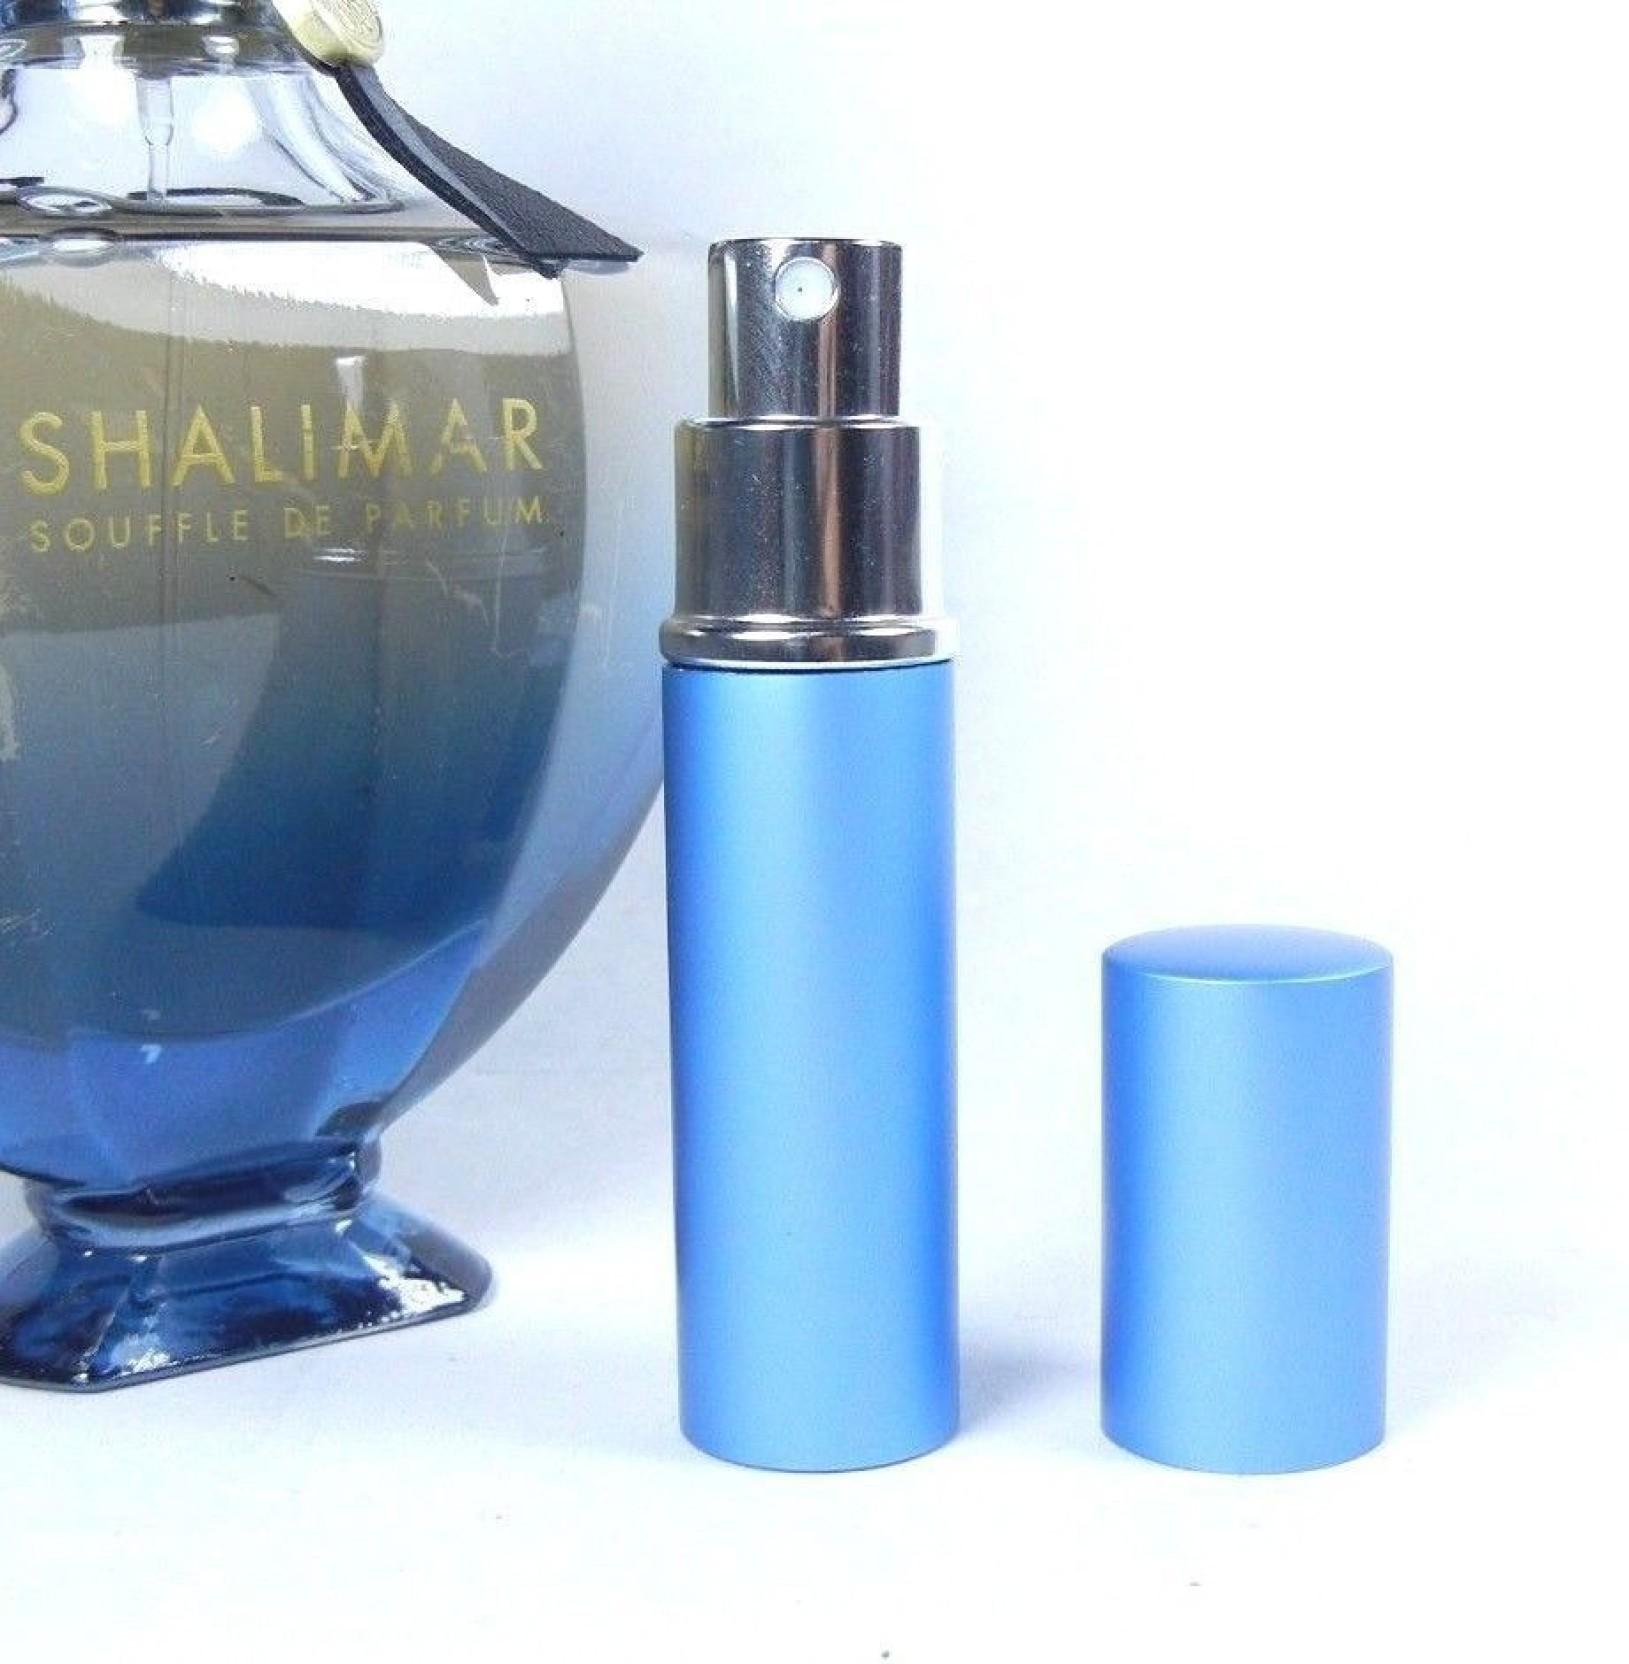 Buy Guerlain Shalimar Souffle De Parfum Eau 6 Ml Online 90ml Share